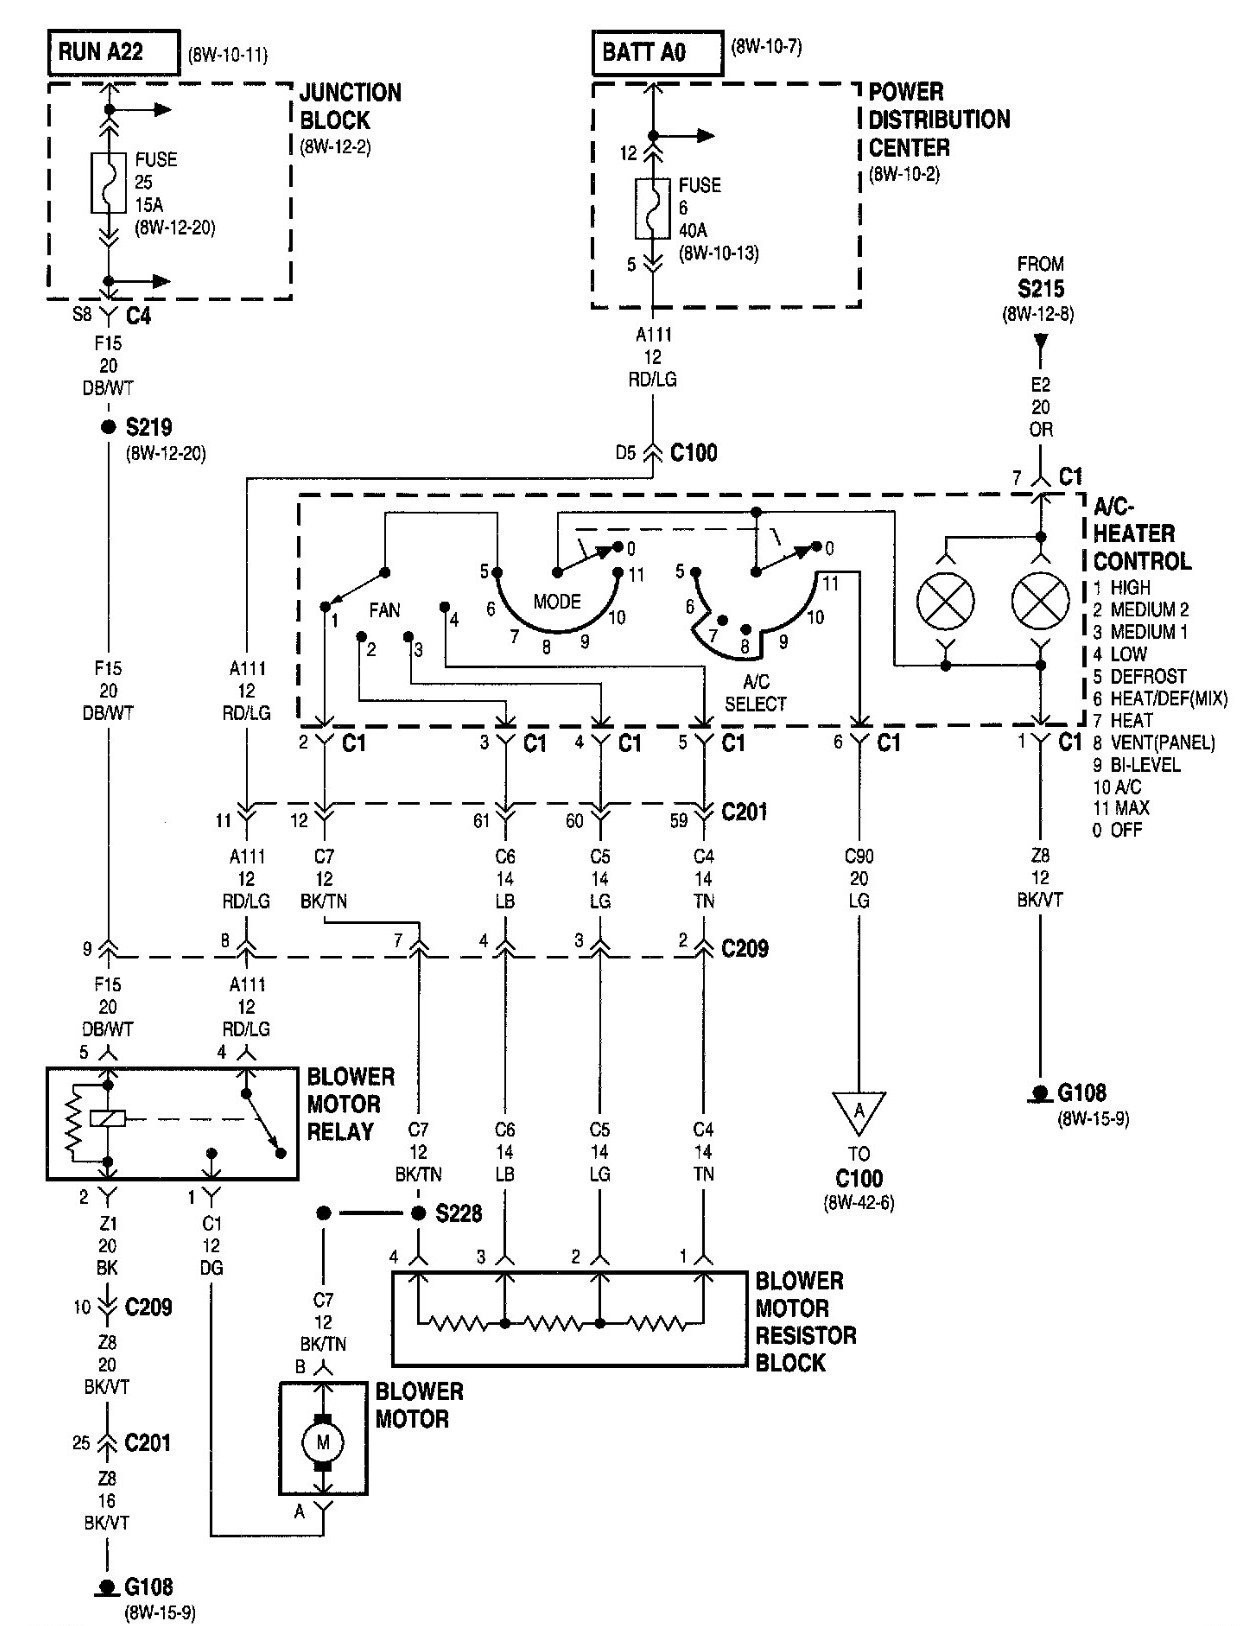 2000 Dodge Caravan Wiring Diagram Wiring Diagrams for 2009 Dodge Caravan Daily Update Wiring Diagram • Of 2000 Dodge Caravan Wiring Diagram